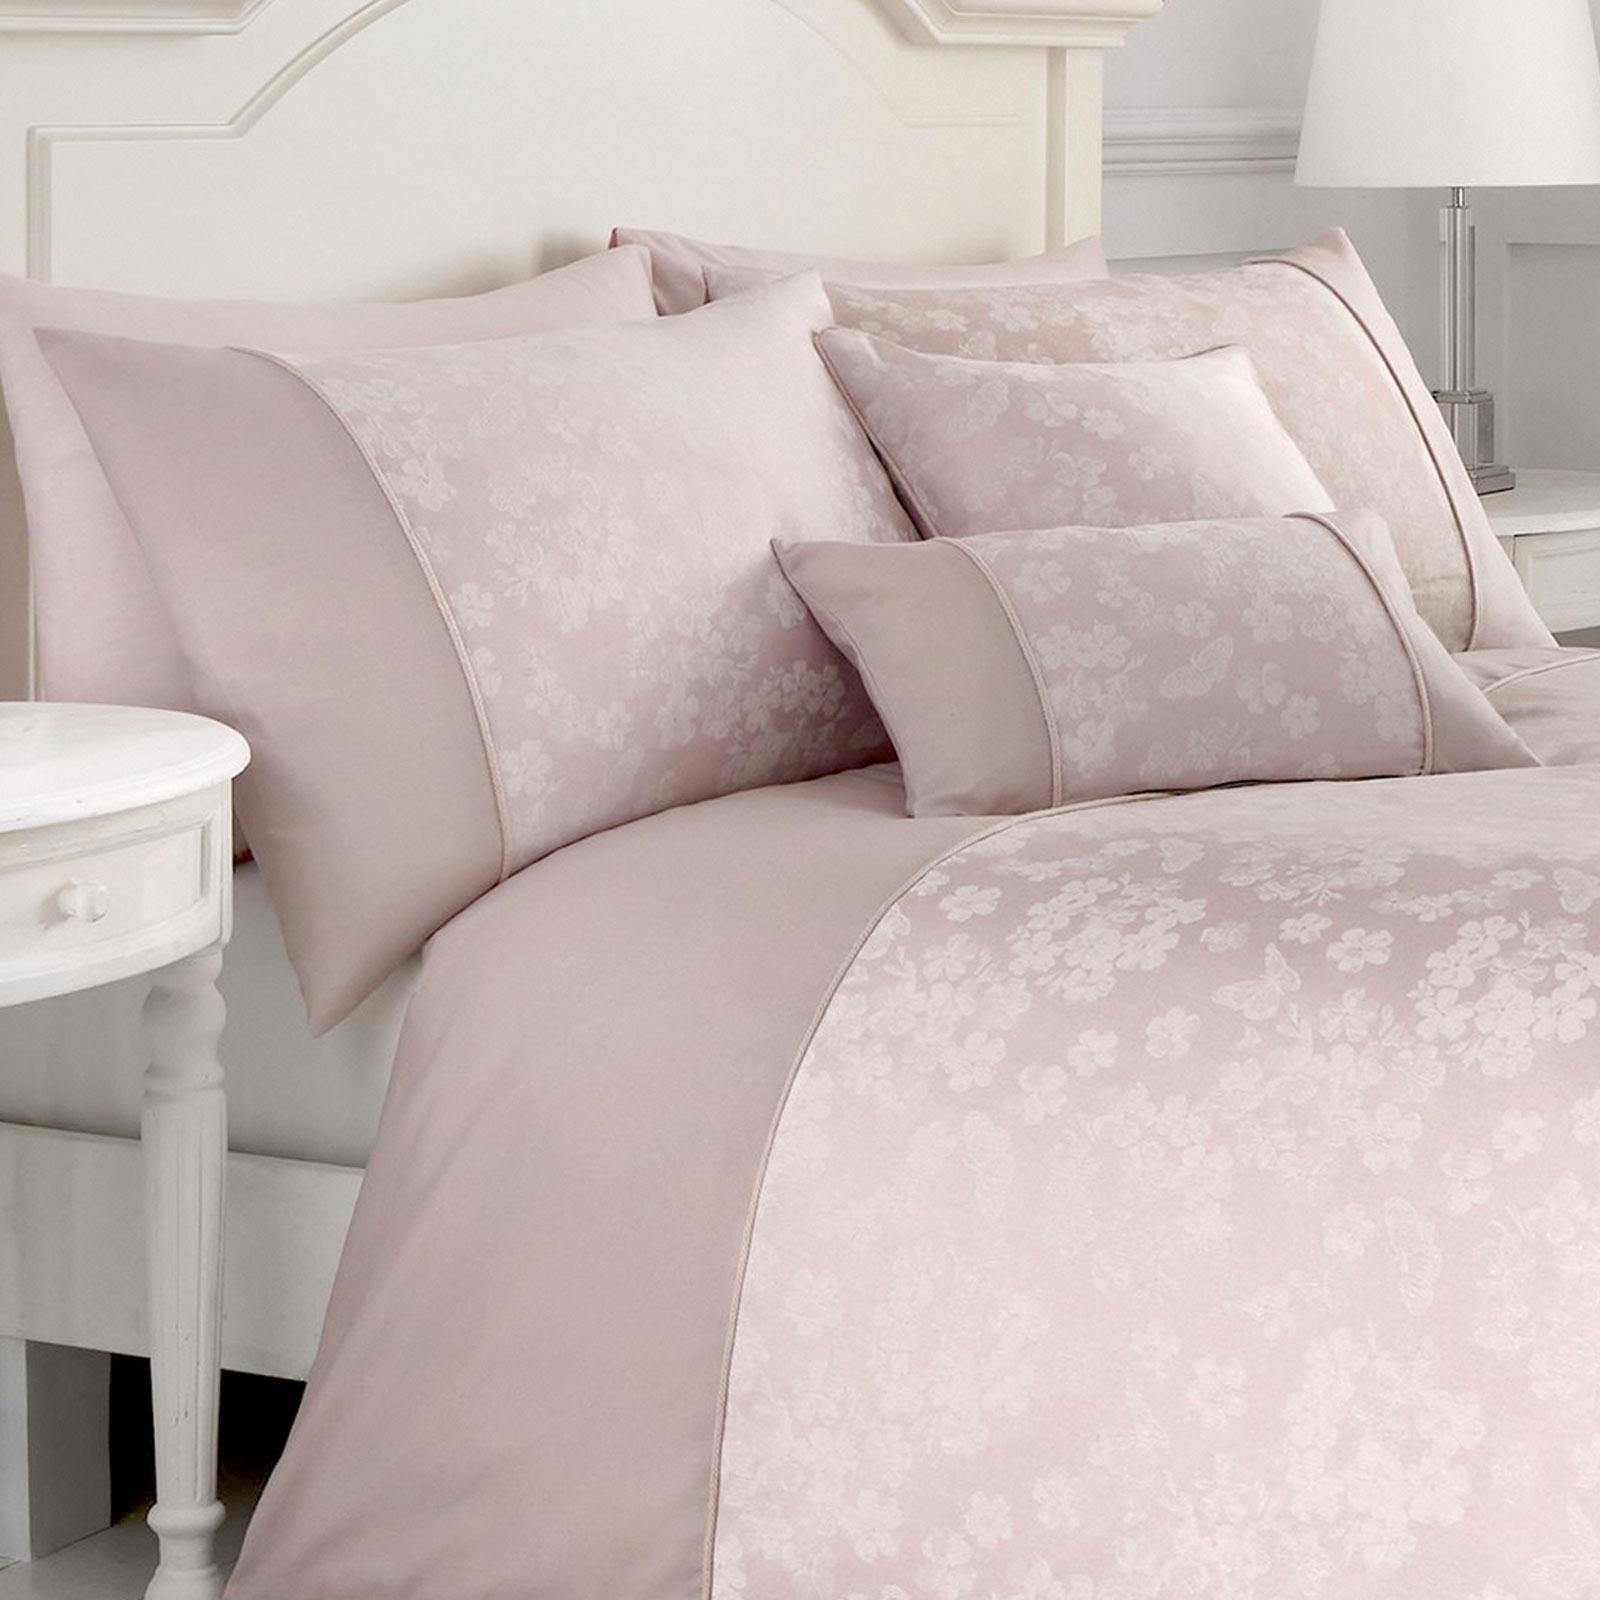 Fundas-de-Edredon-Rosa-Blush-Jacquard-Floral-Cubierta-Del-Edredon-Conjuntos-de-Ropa-de-cama-de-lujo miniatura 4